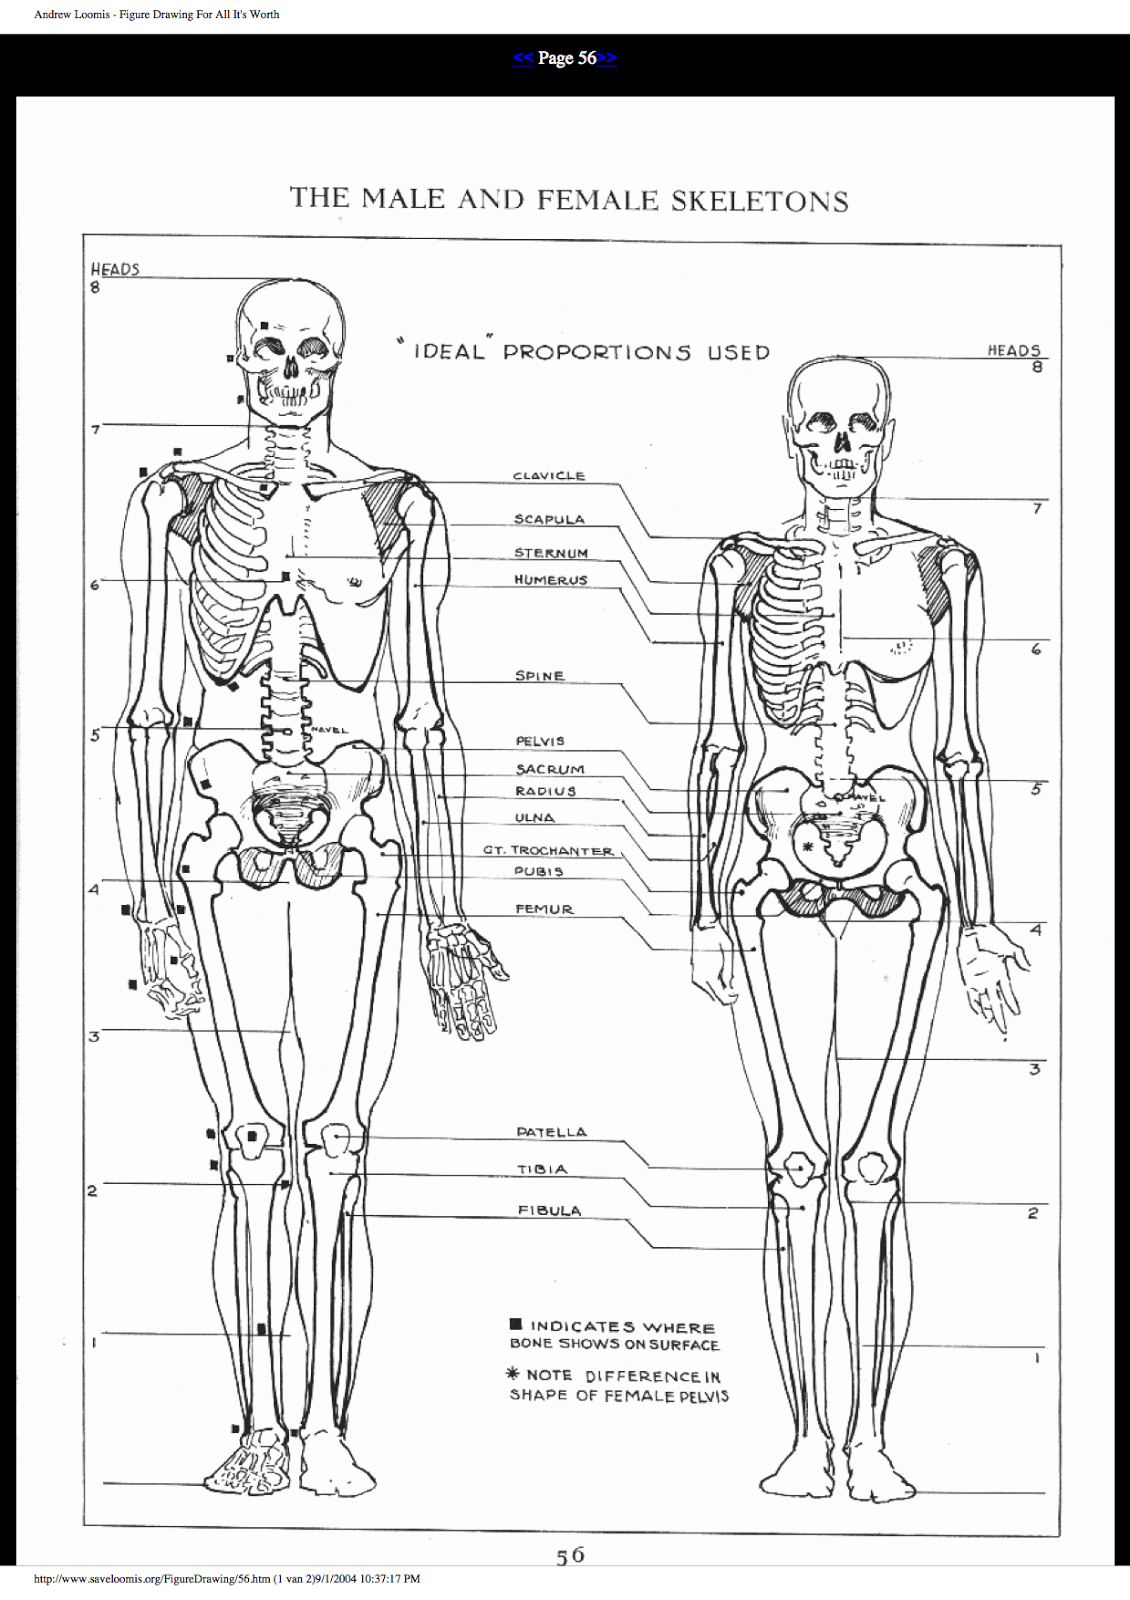 Loomis Human Anatomy | Human Anatomy | Pinterest | Human anatomy and ...